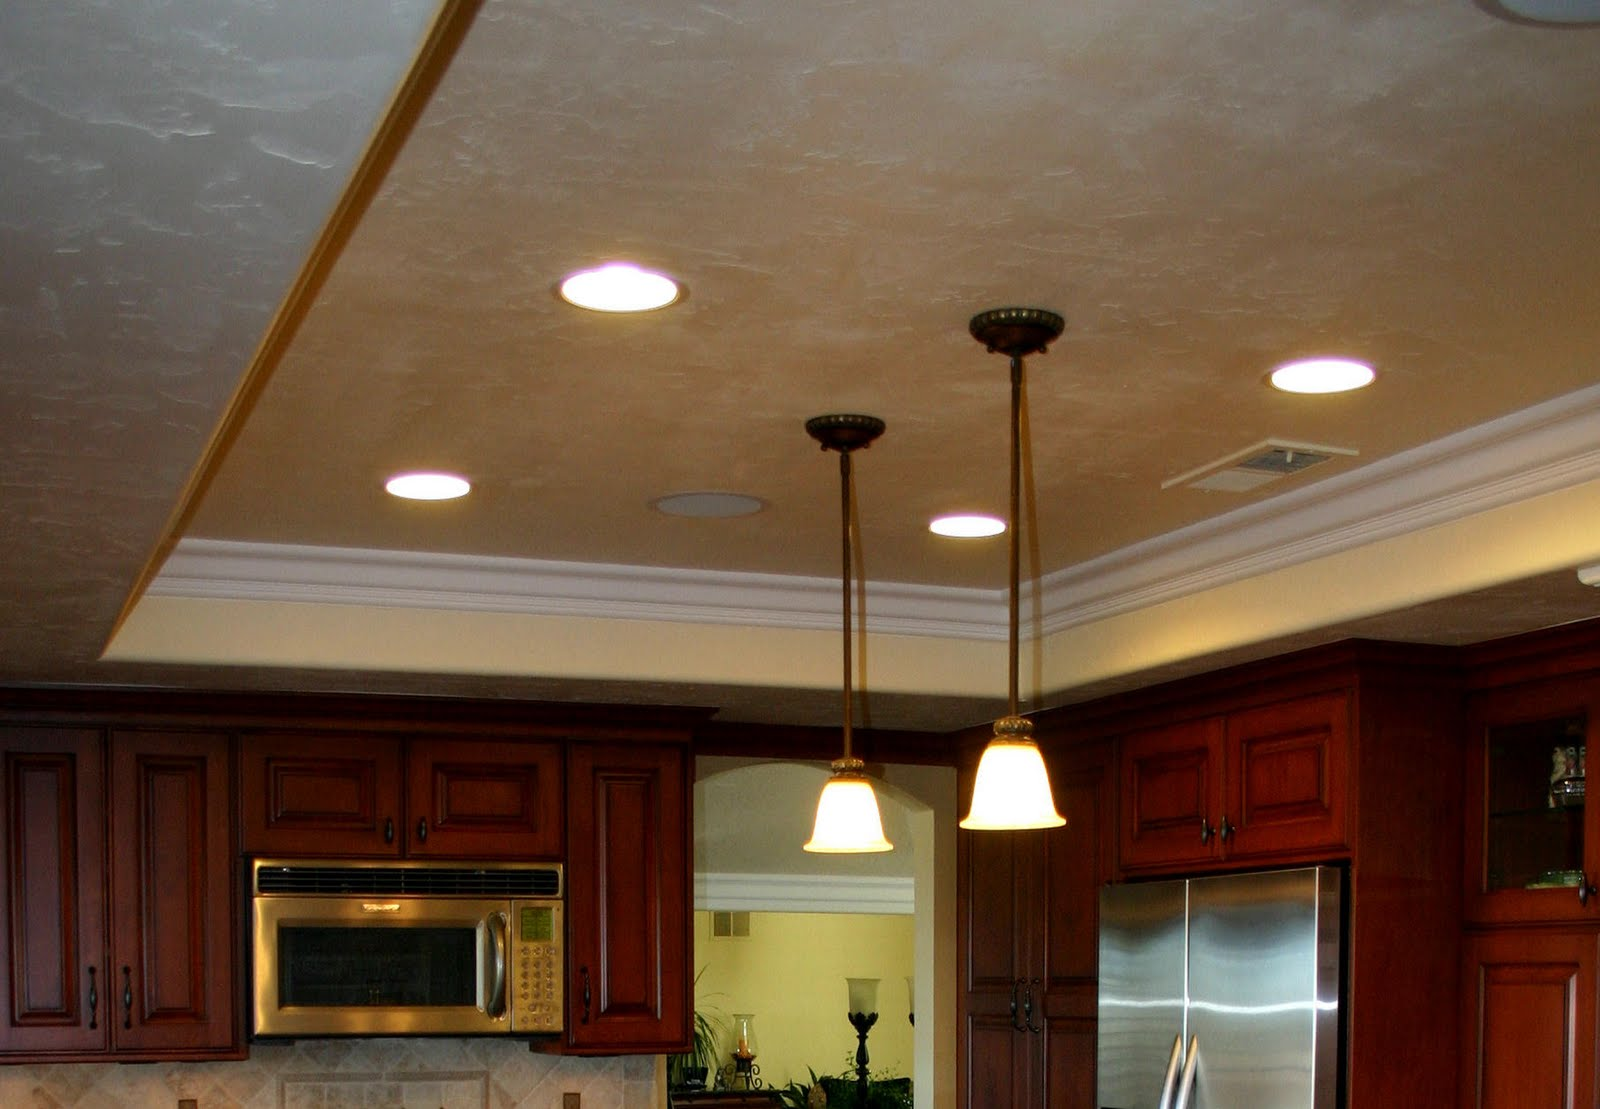 kitchen ceiling lighting rv sink c b i d home decor and design 04 10